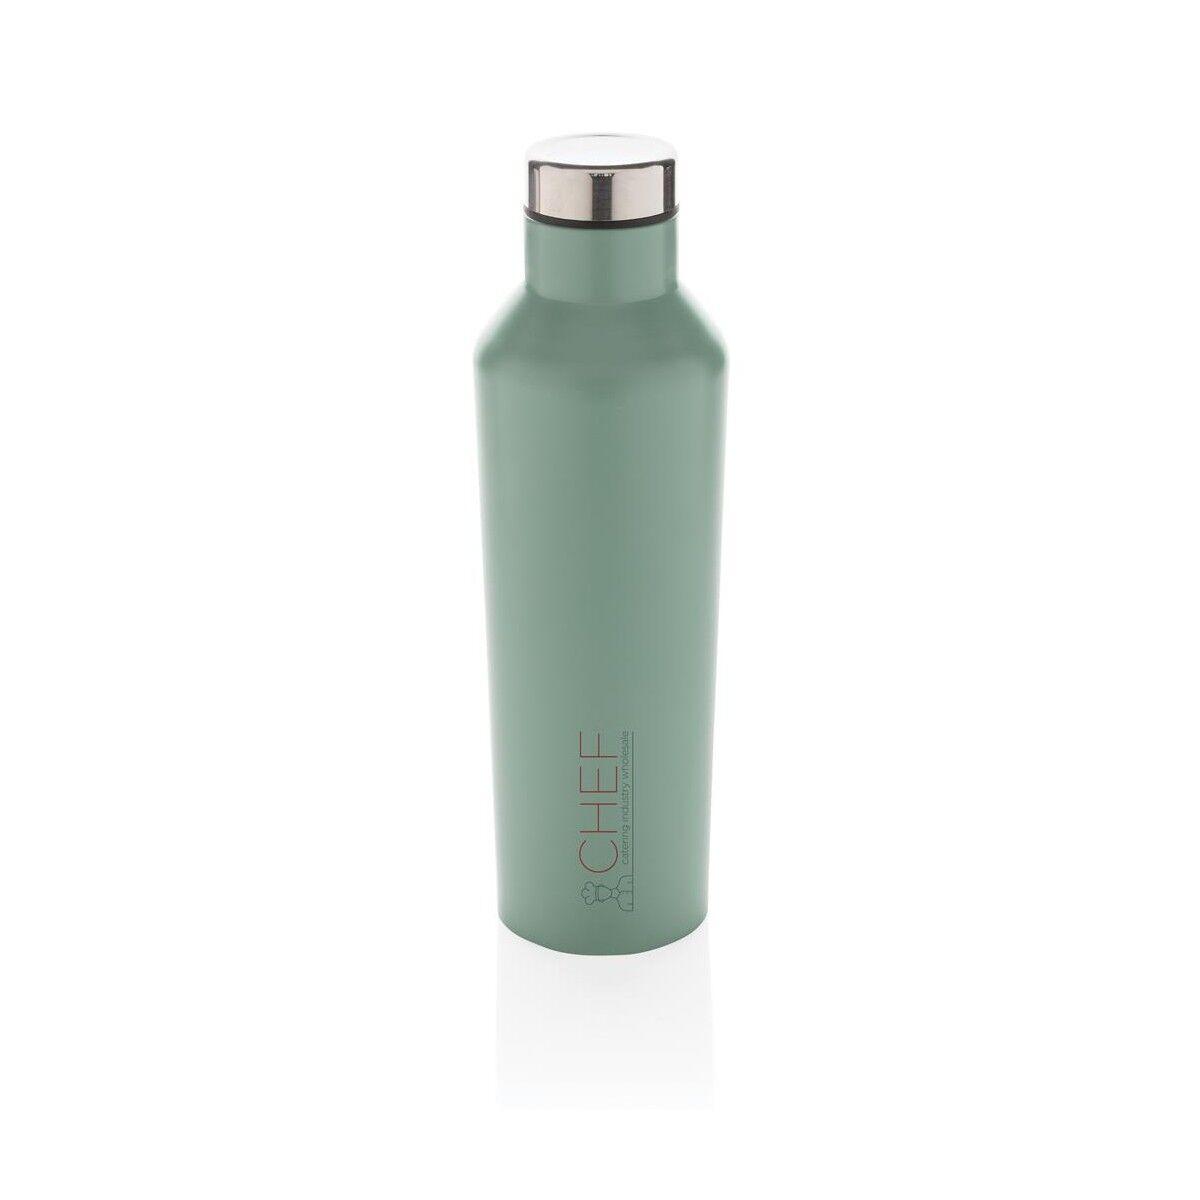 Auckland vacuum Stainless Steel Bottle - Green